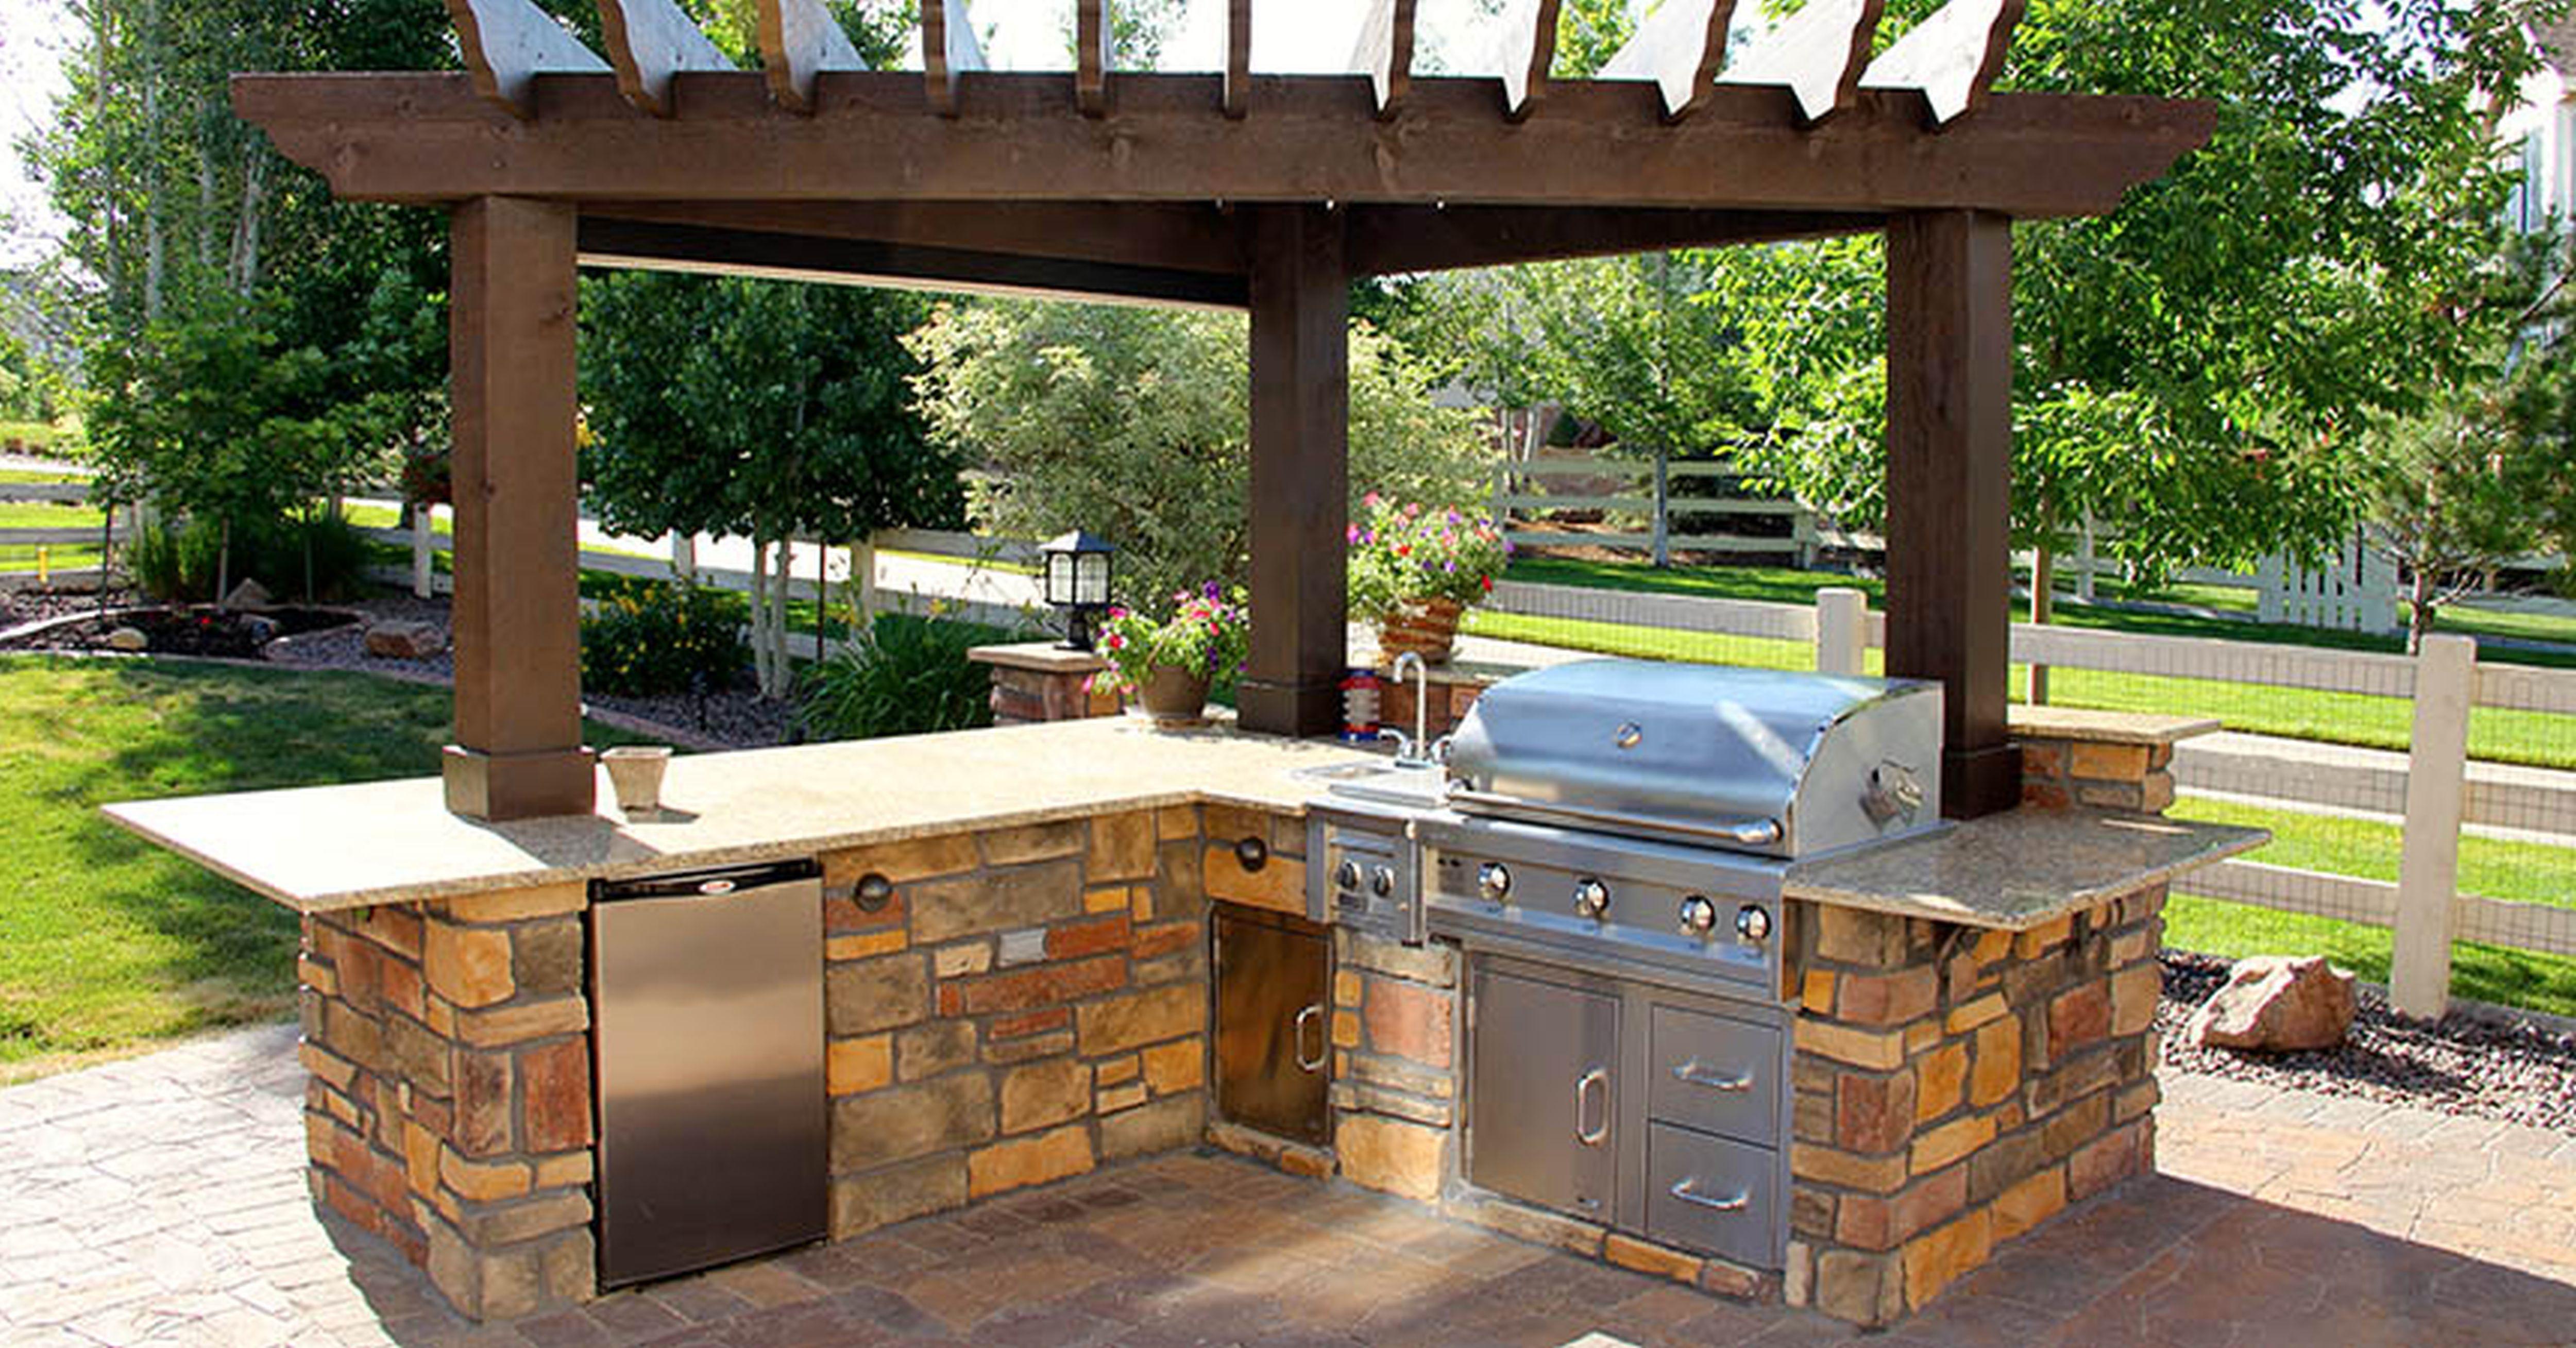 25+ brilliant ideas for outdoor kitchen designs, build & remodel